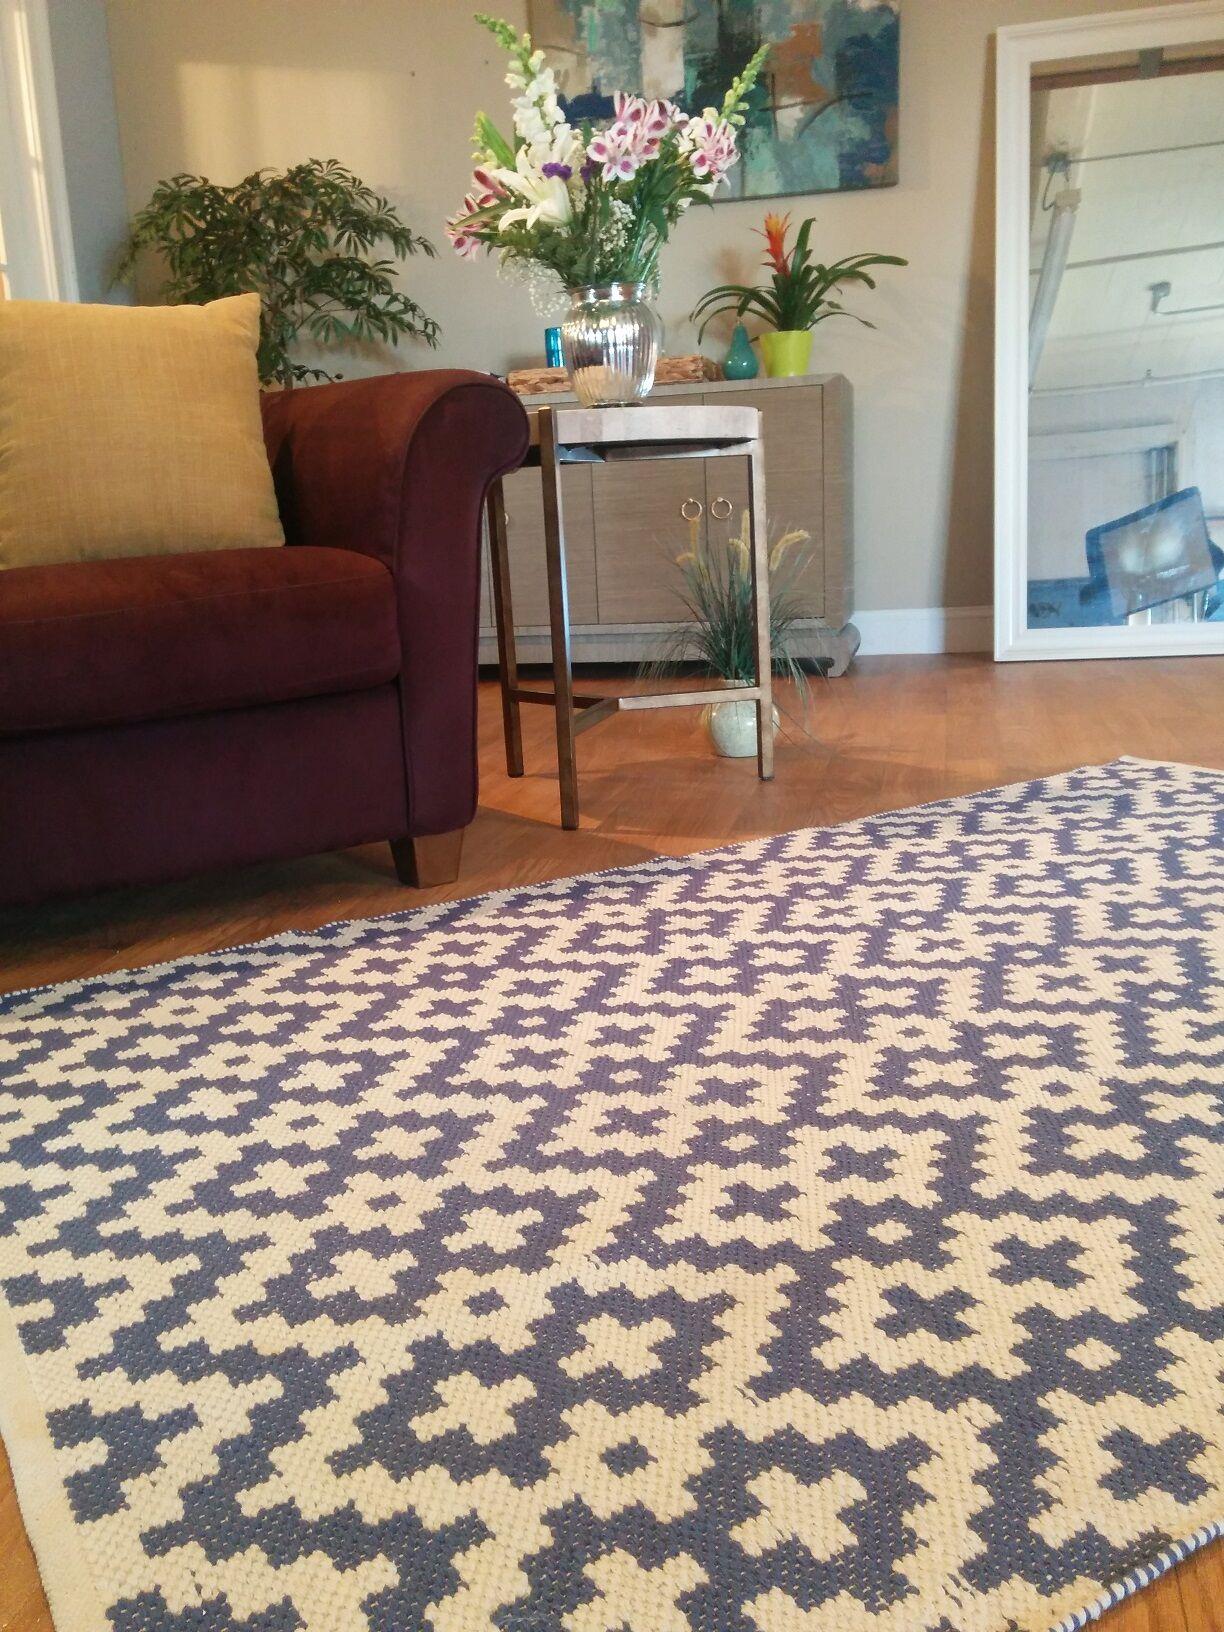 Zen Samsara Cotton Charcoal Gray/White Area Rug Rug Size: 6' x 9'